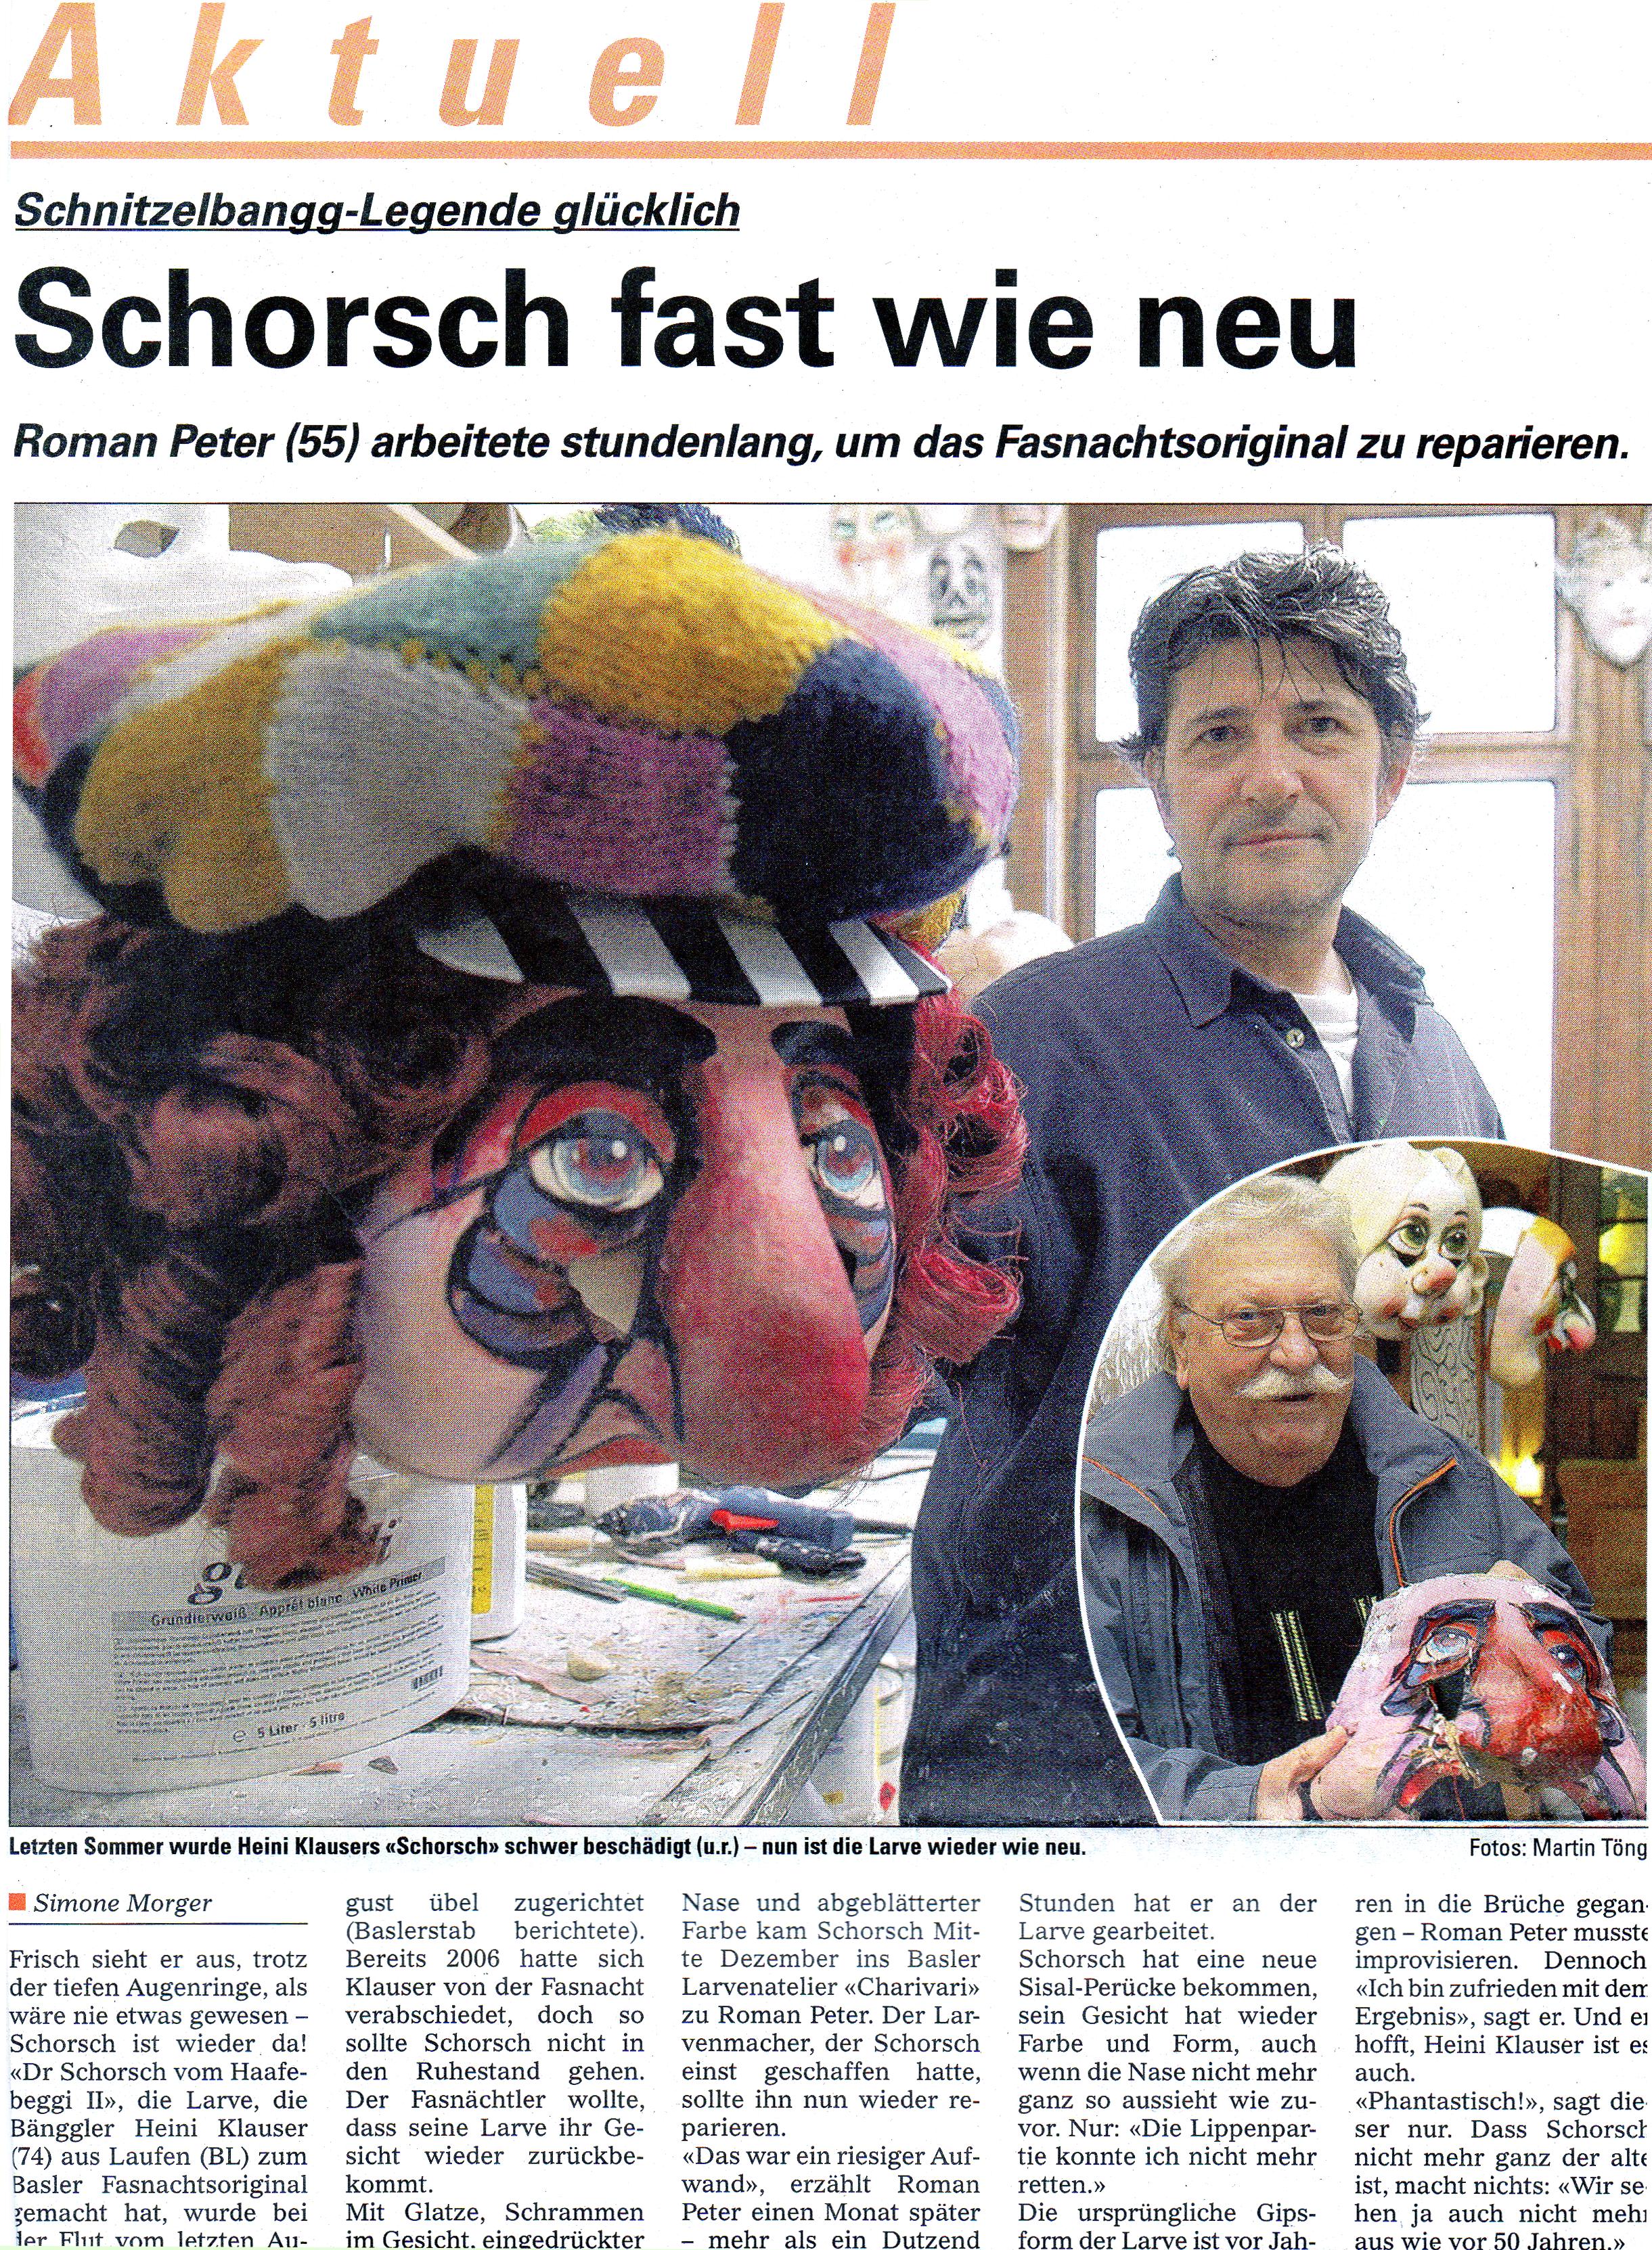 Februar 2008, Baslerstab